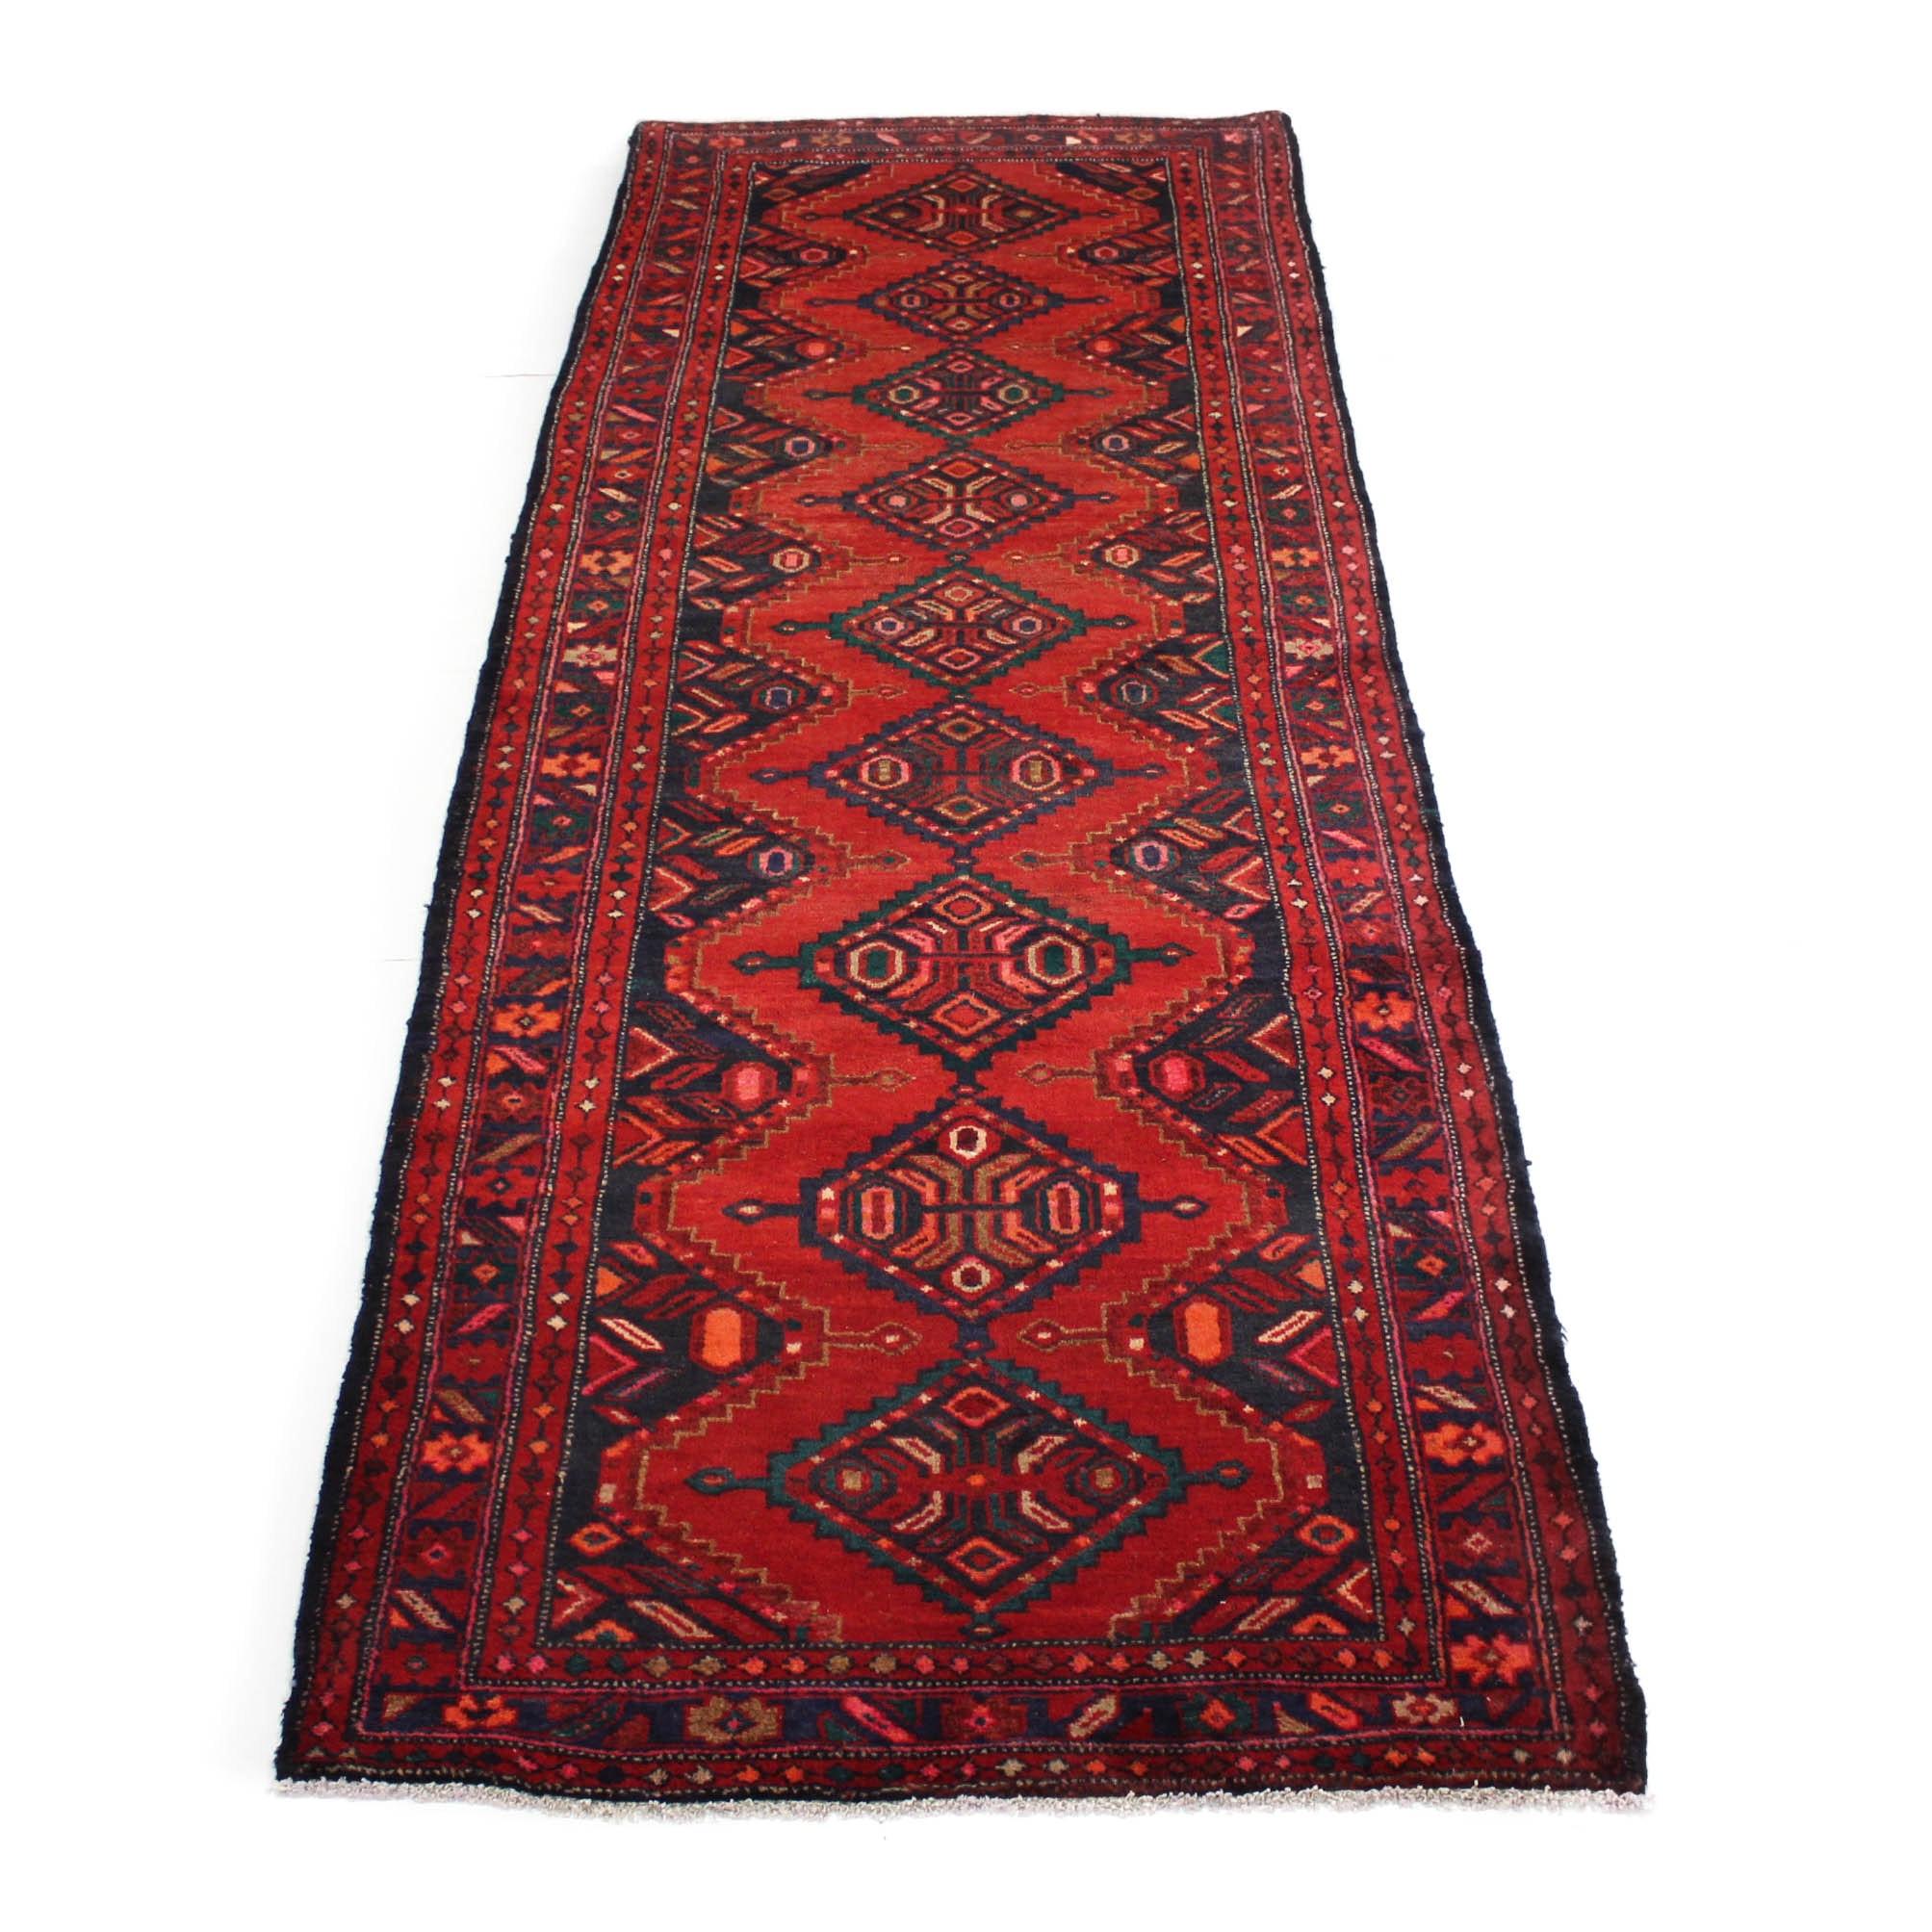 3'7 x 10' Semi-Antique Hand-Knotted Northwest Persian Chenar Carpet Runner